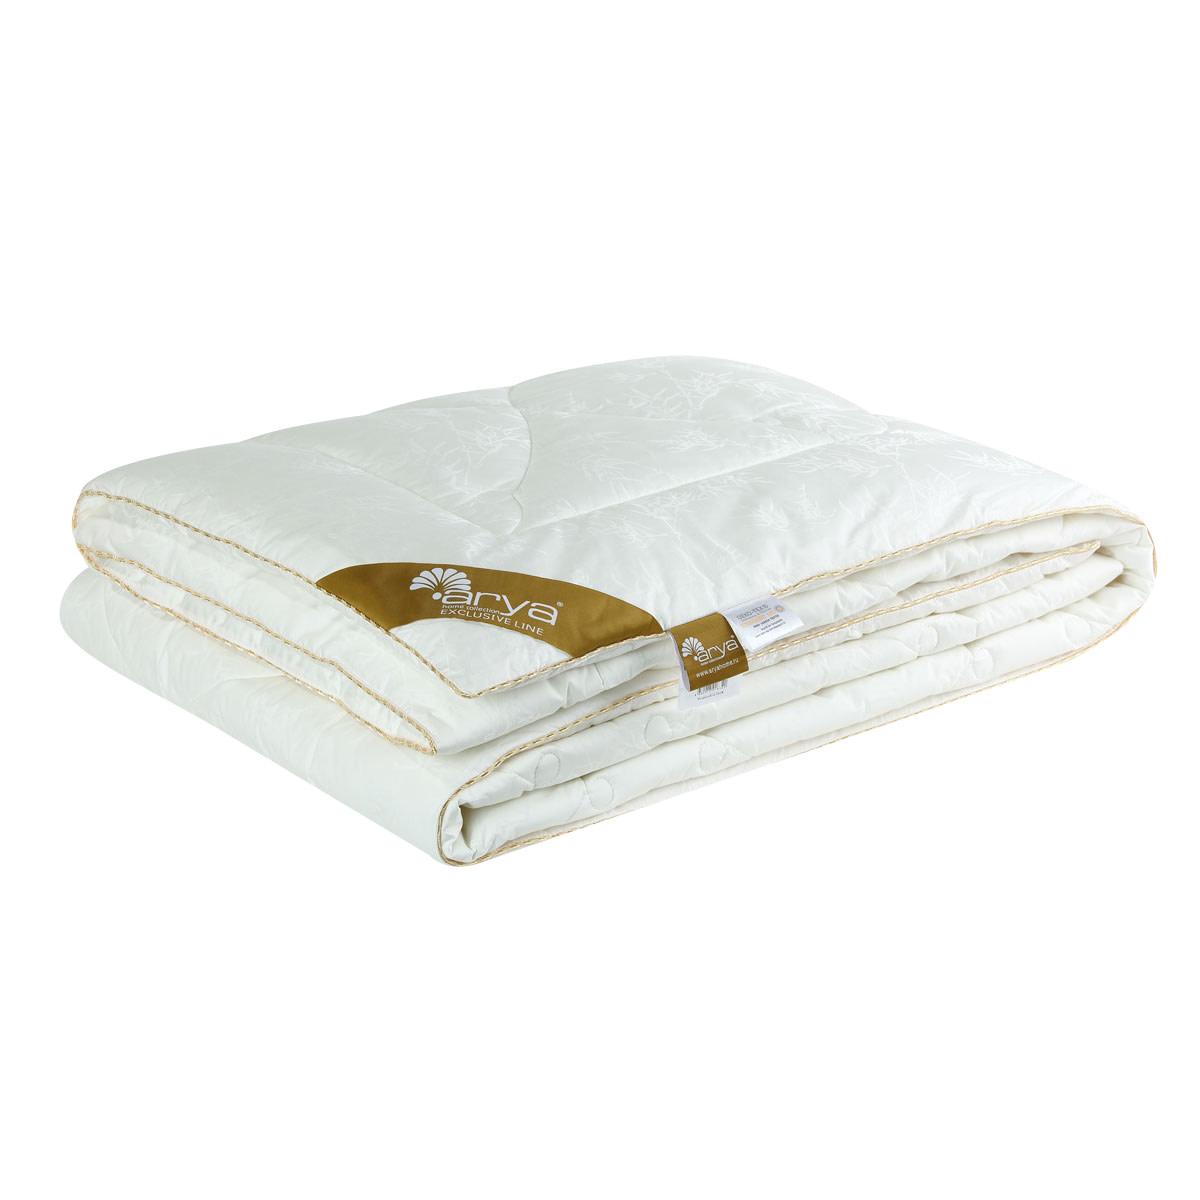 Одеяло Arya home collection Bamboo-Kun 215х155 см синтепон